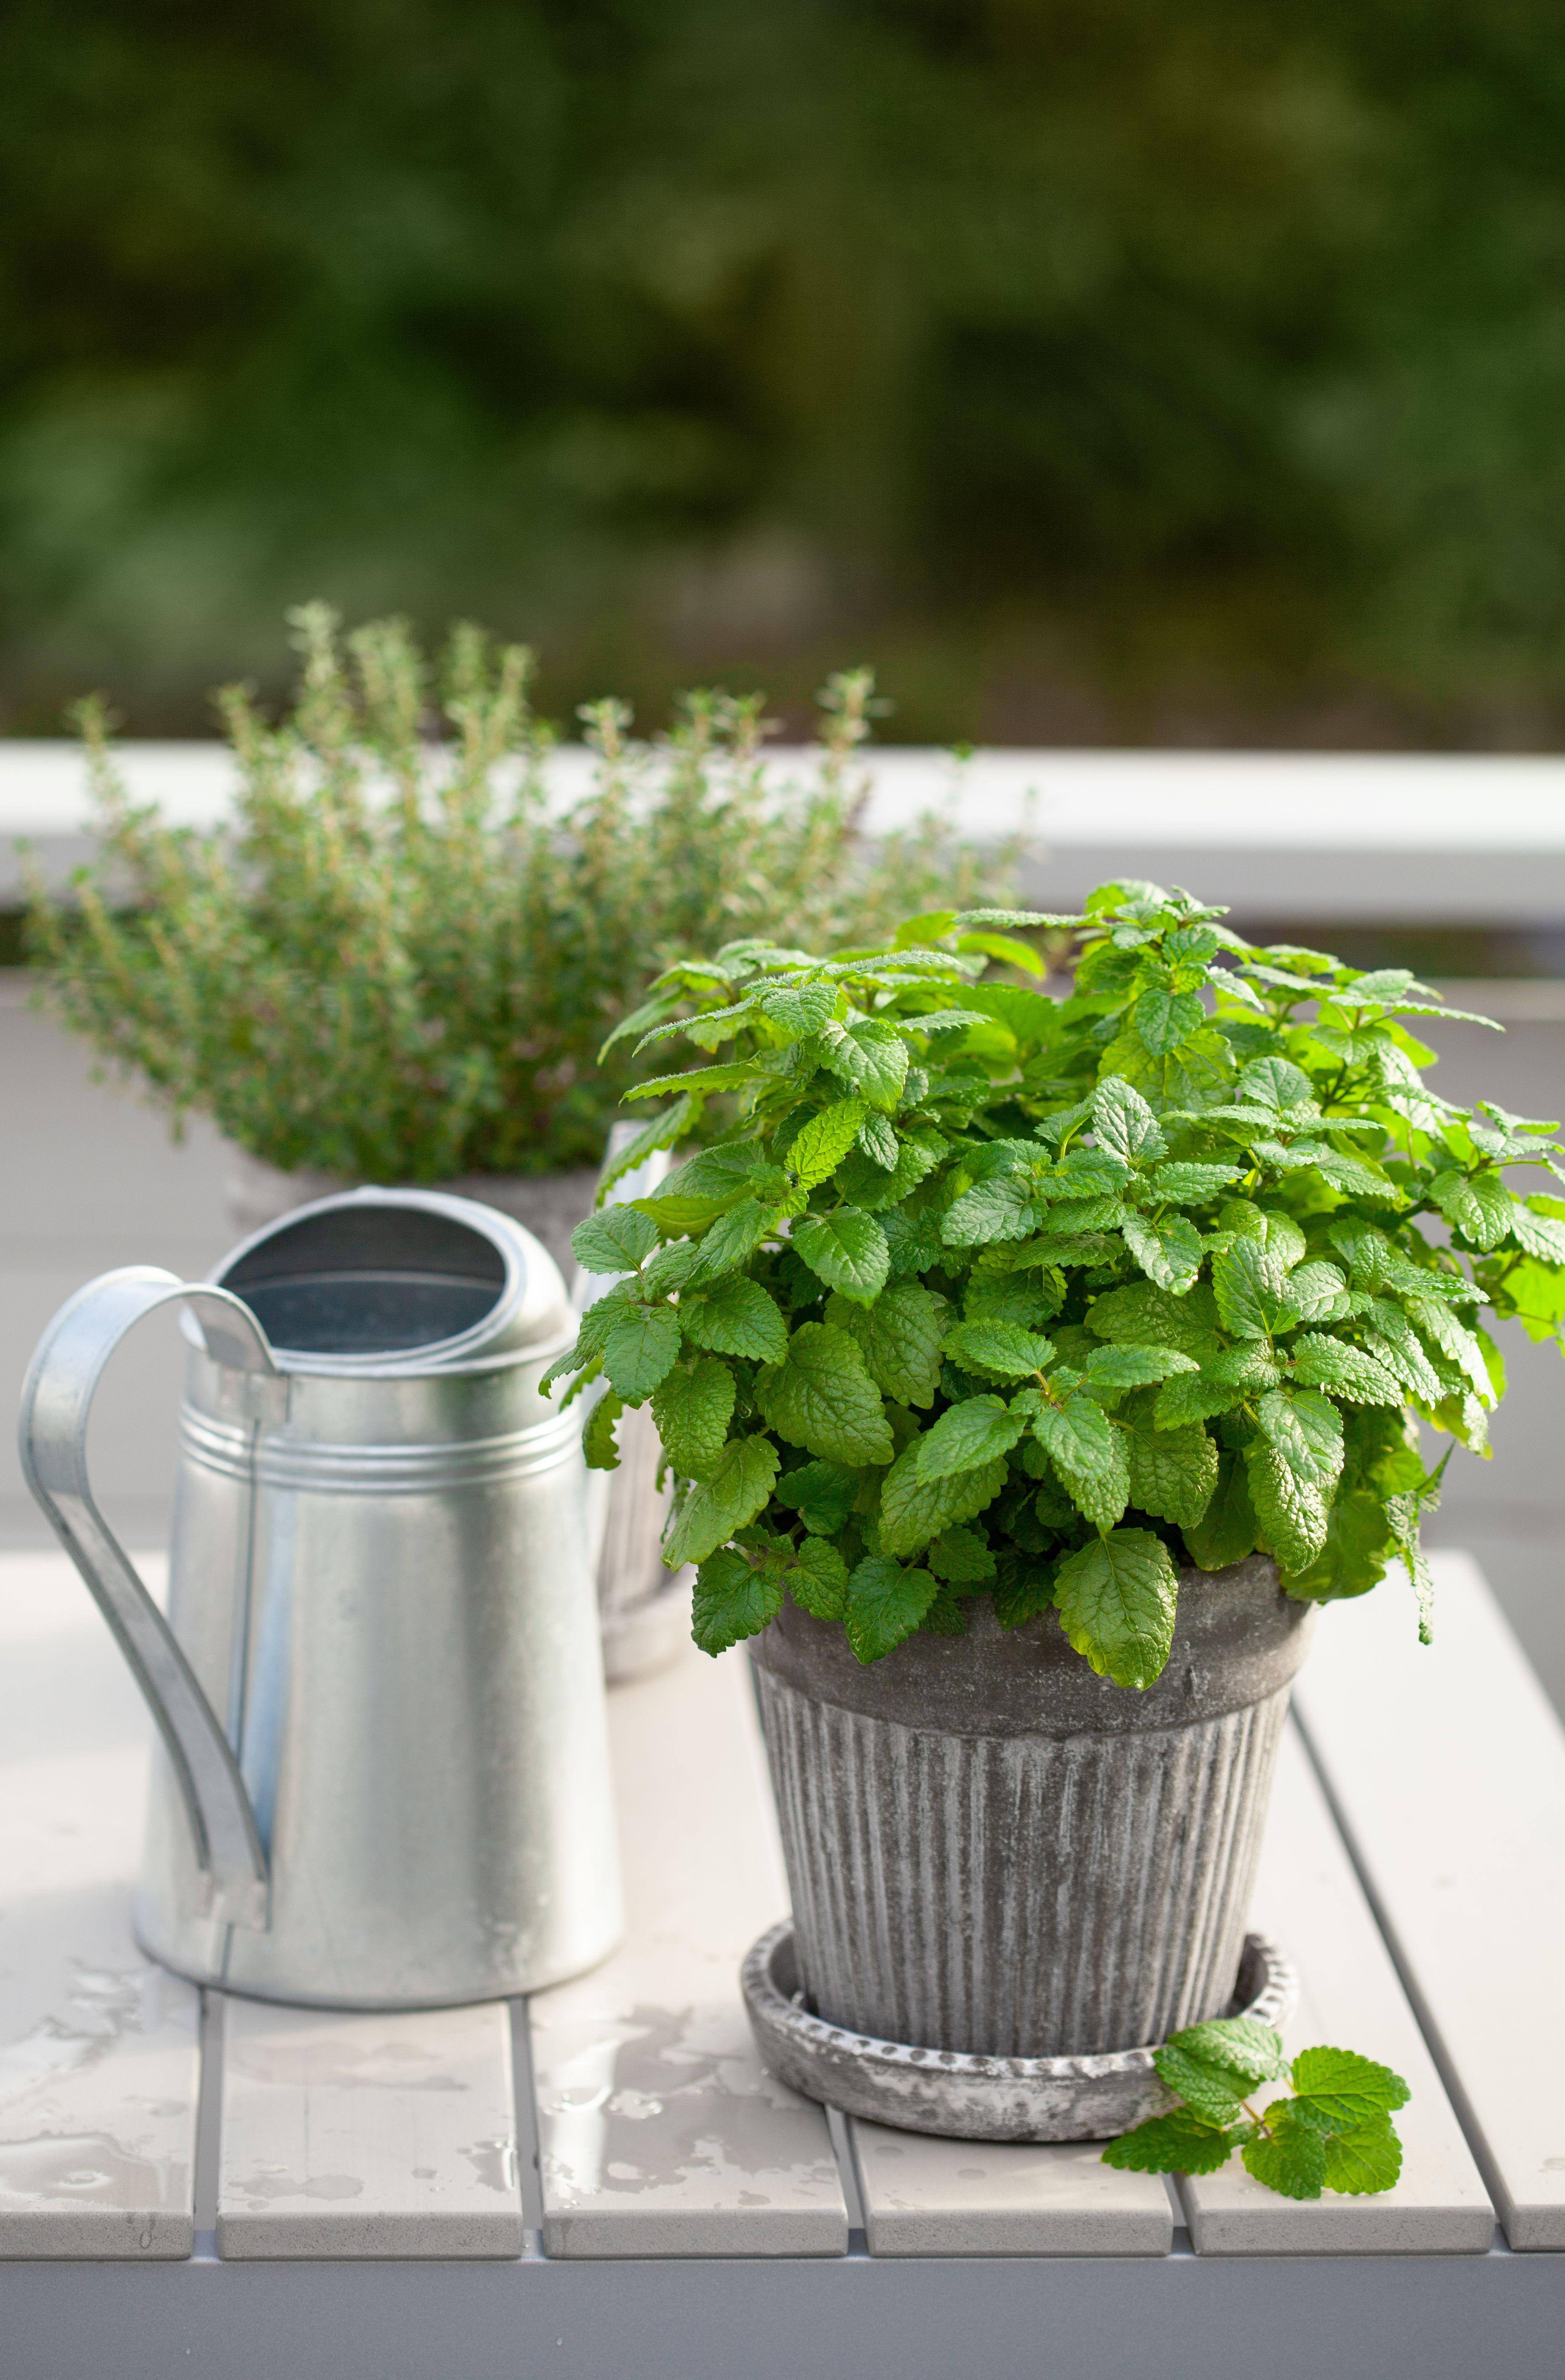 Balcony Herb Garden Guide in 2020 Balcony herb gardens